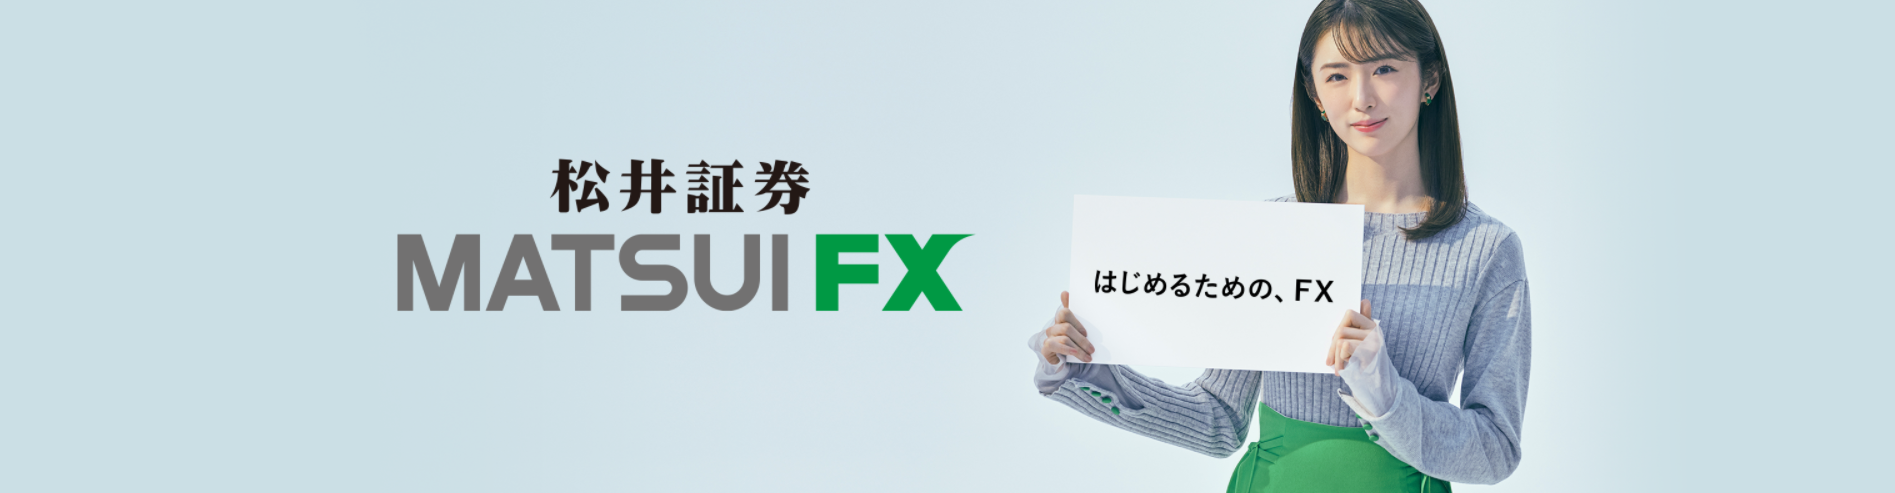 "<img src=""img_60b439bfe8232.png"" alt=""松井証券 MATSUI FX"">"